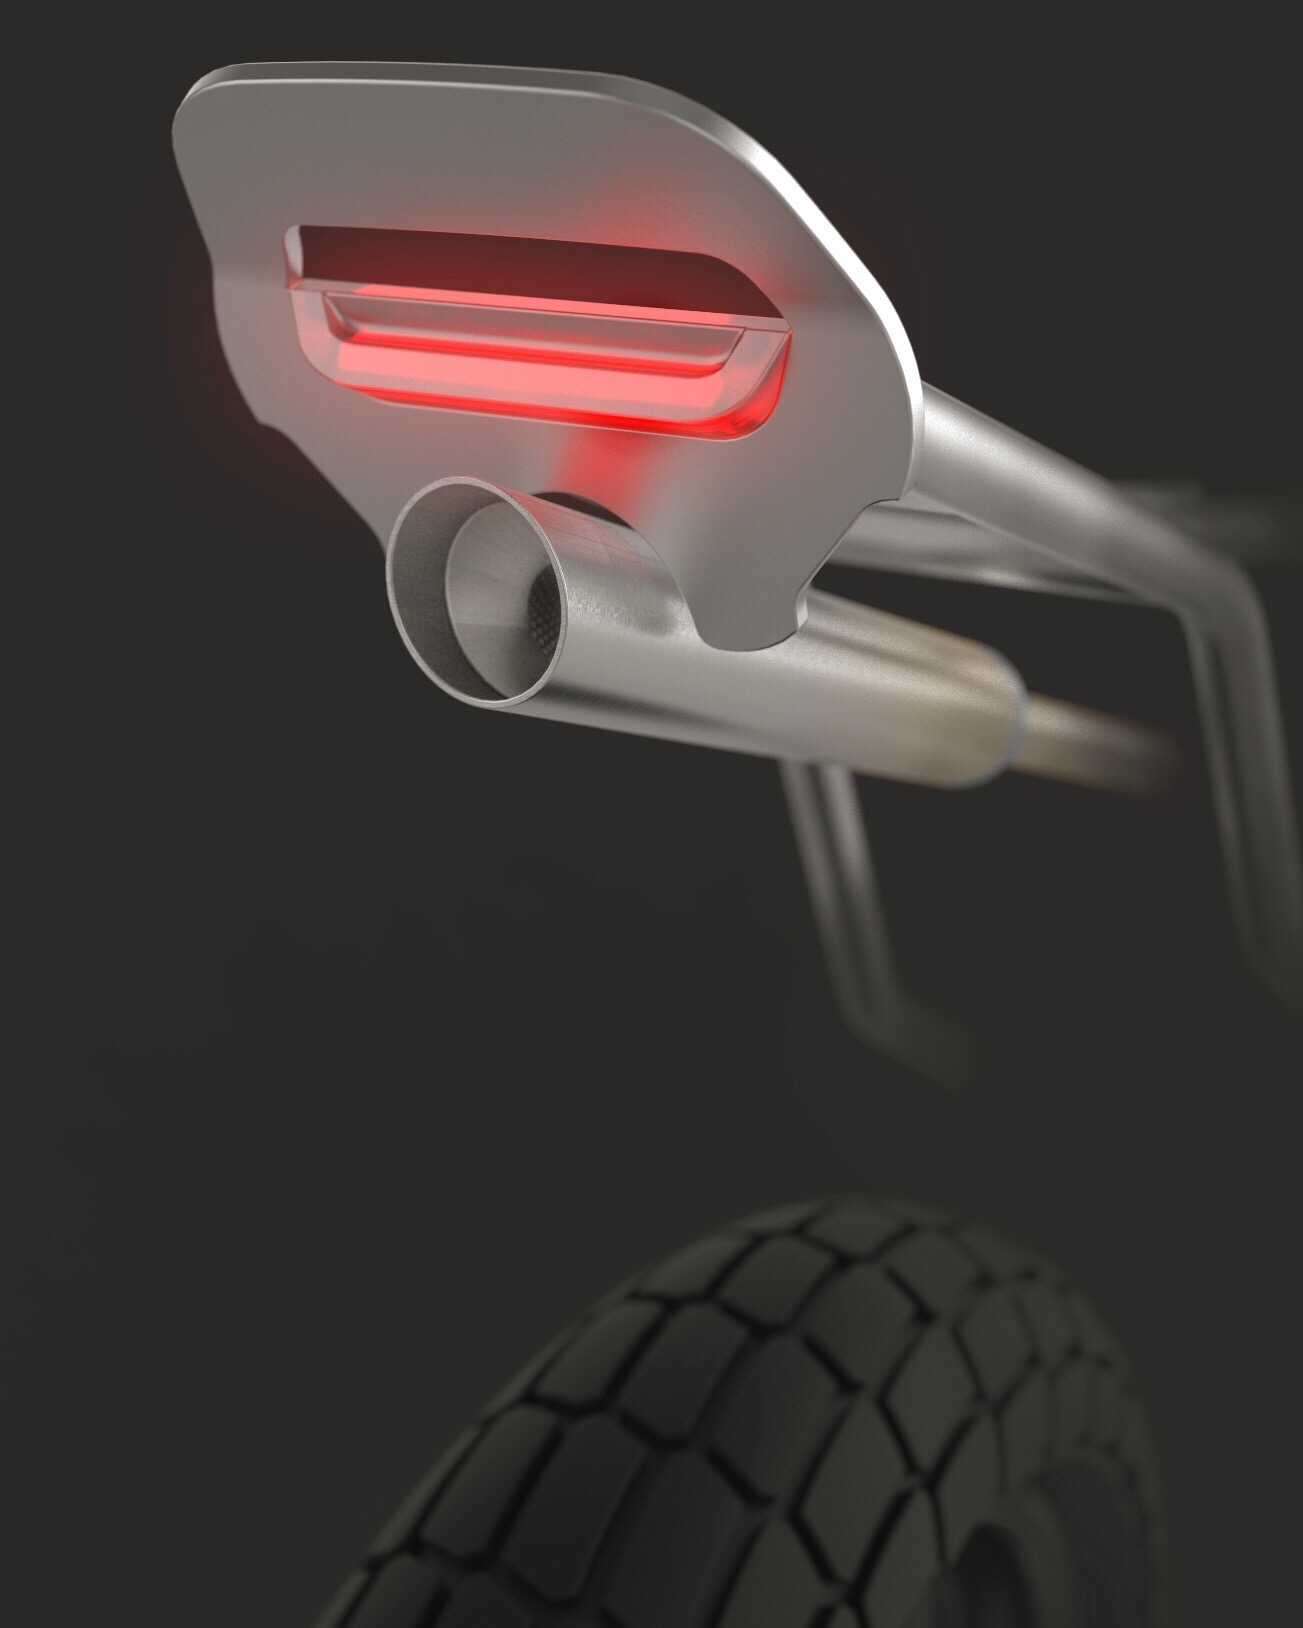 Moto-Mucci_Custom_KTM_300_Build (11).jpg